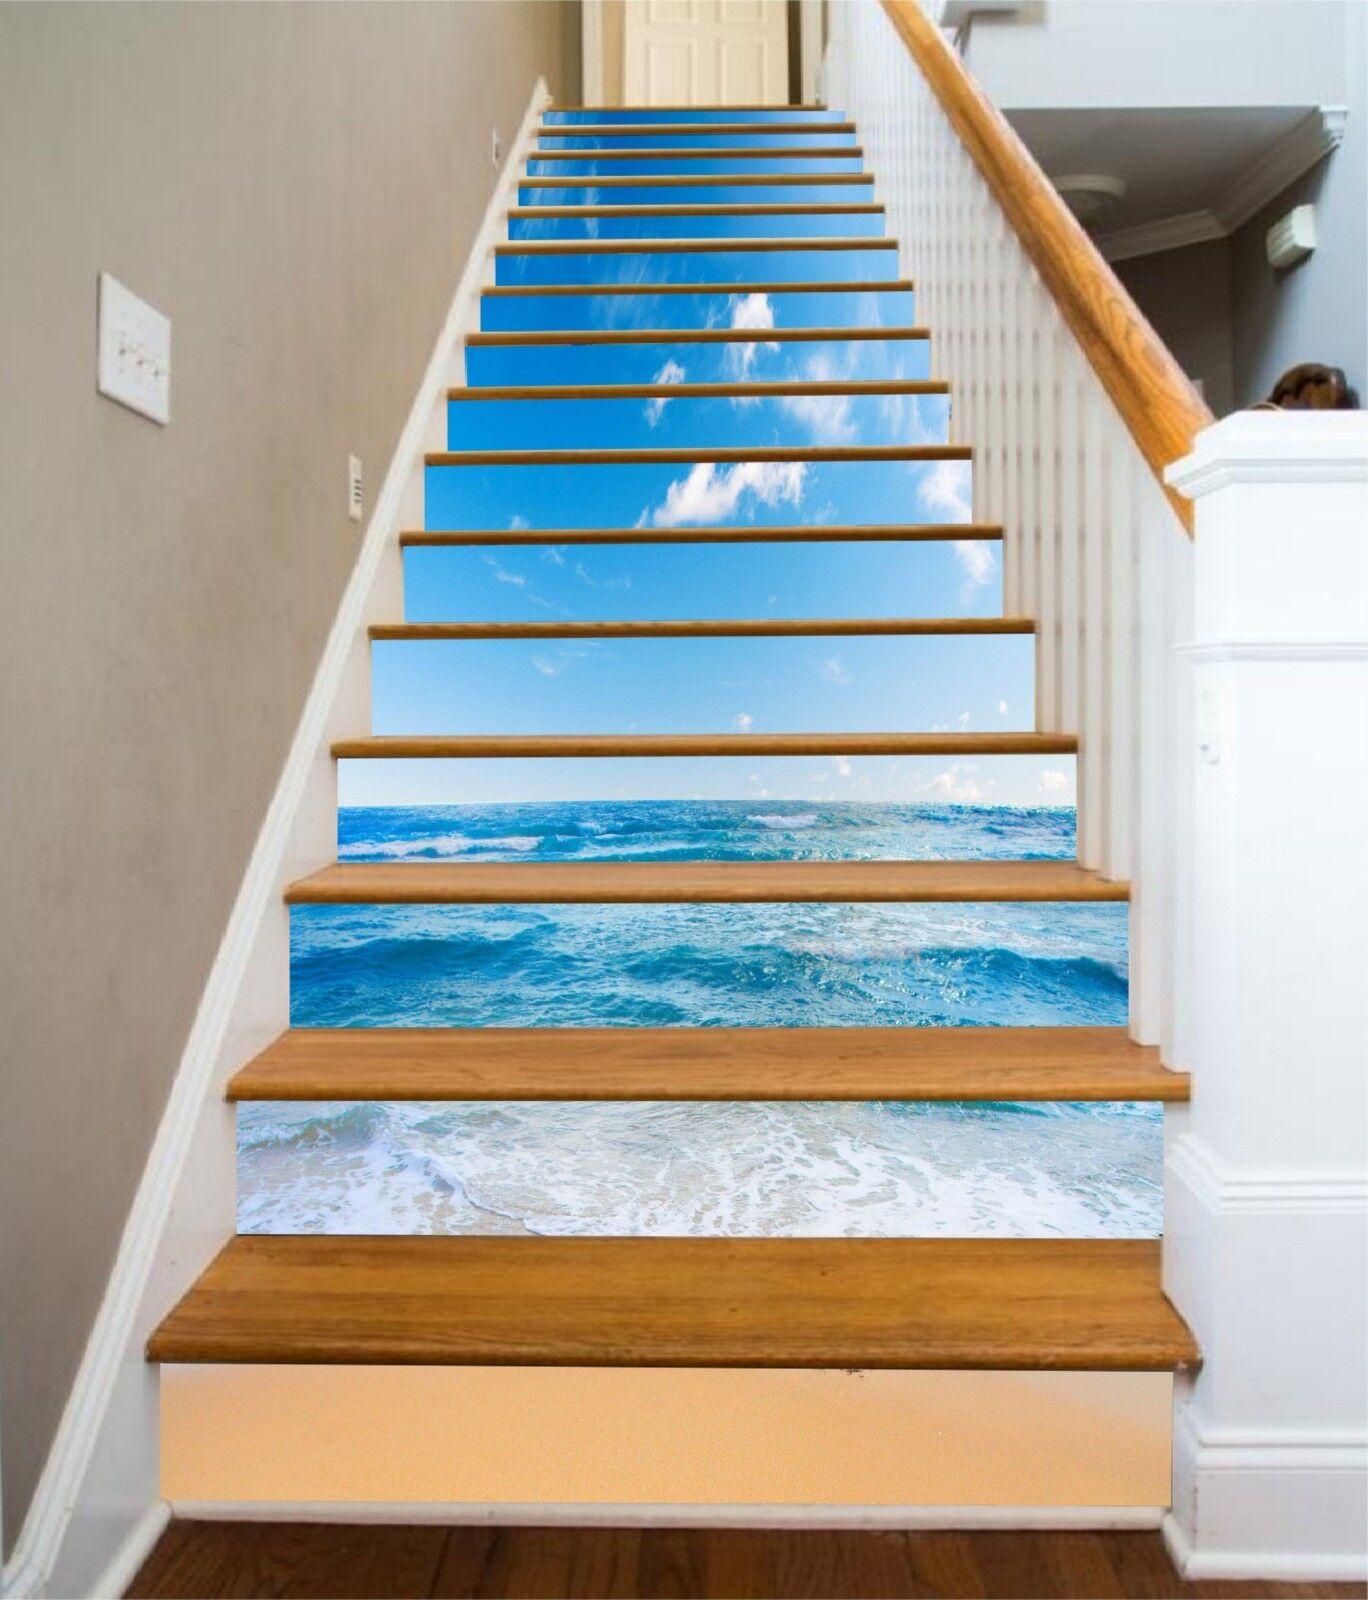 3D Bule Sky Sea Stair Risers Decoration Photo Mural Vinyl Decal Wallpaper US